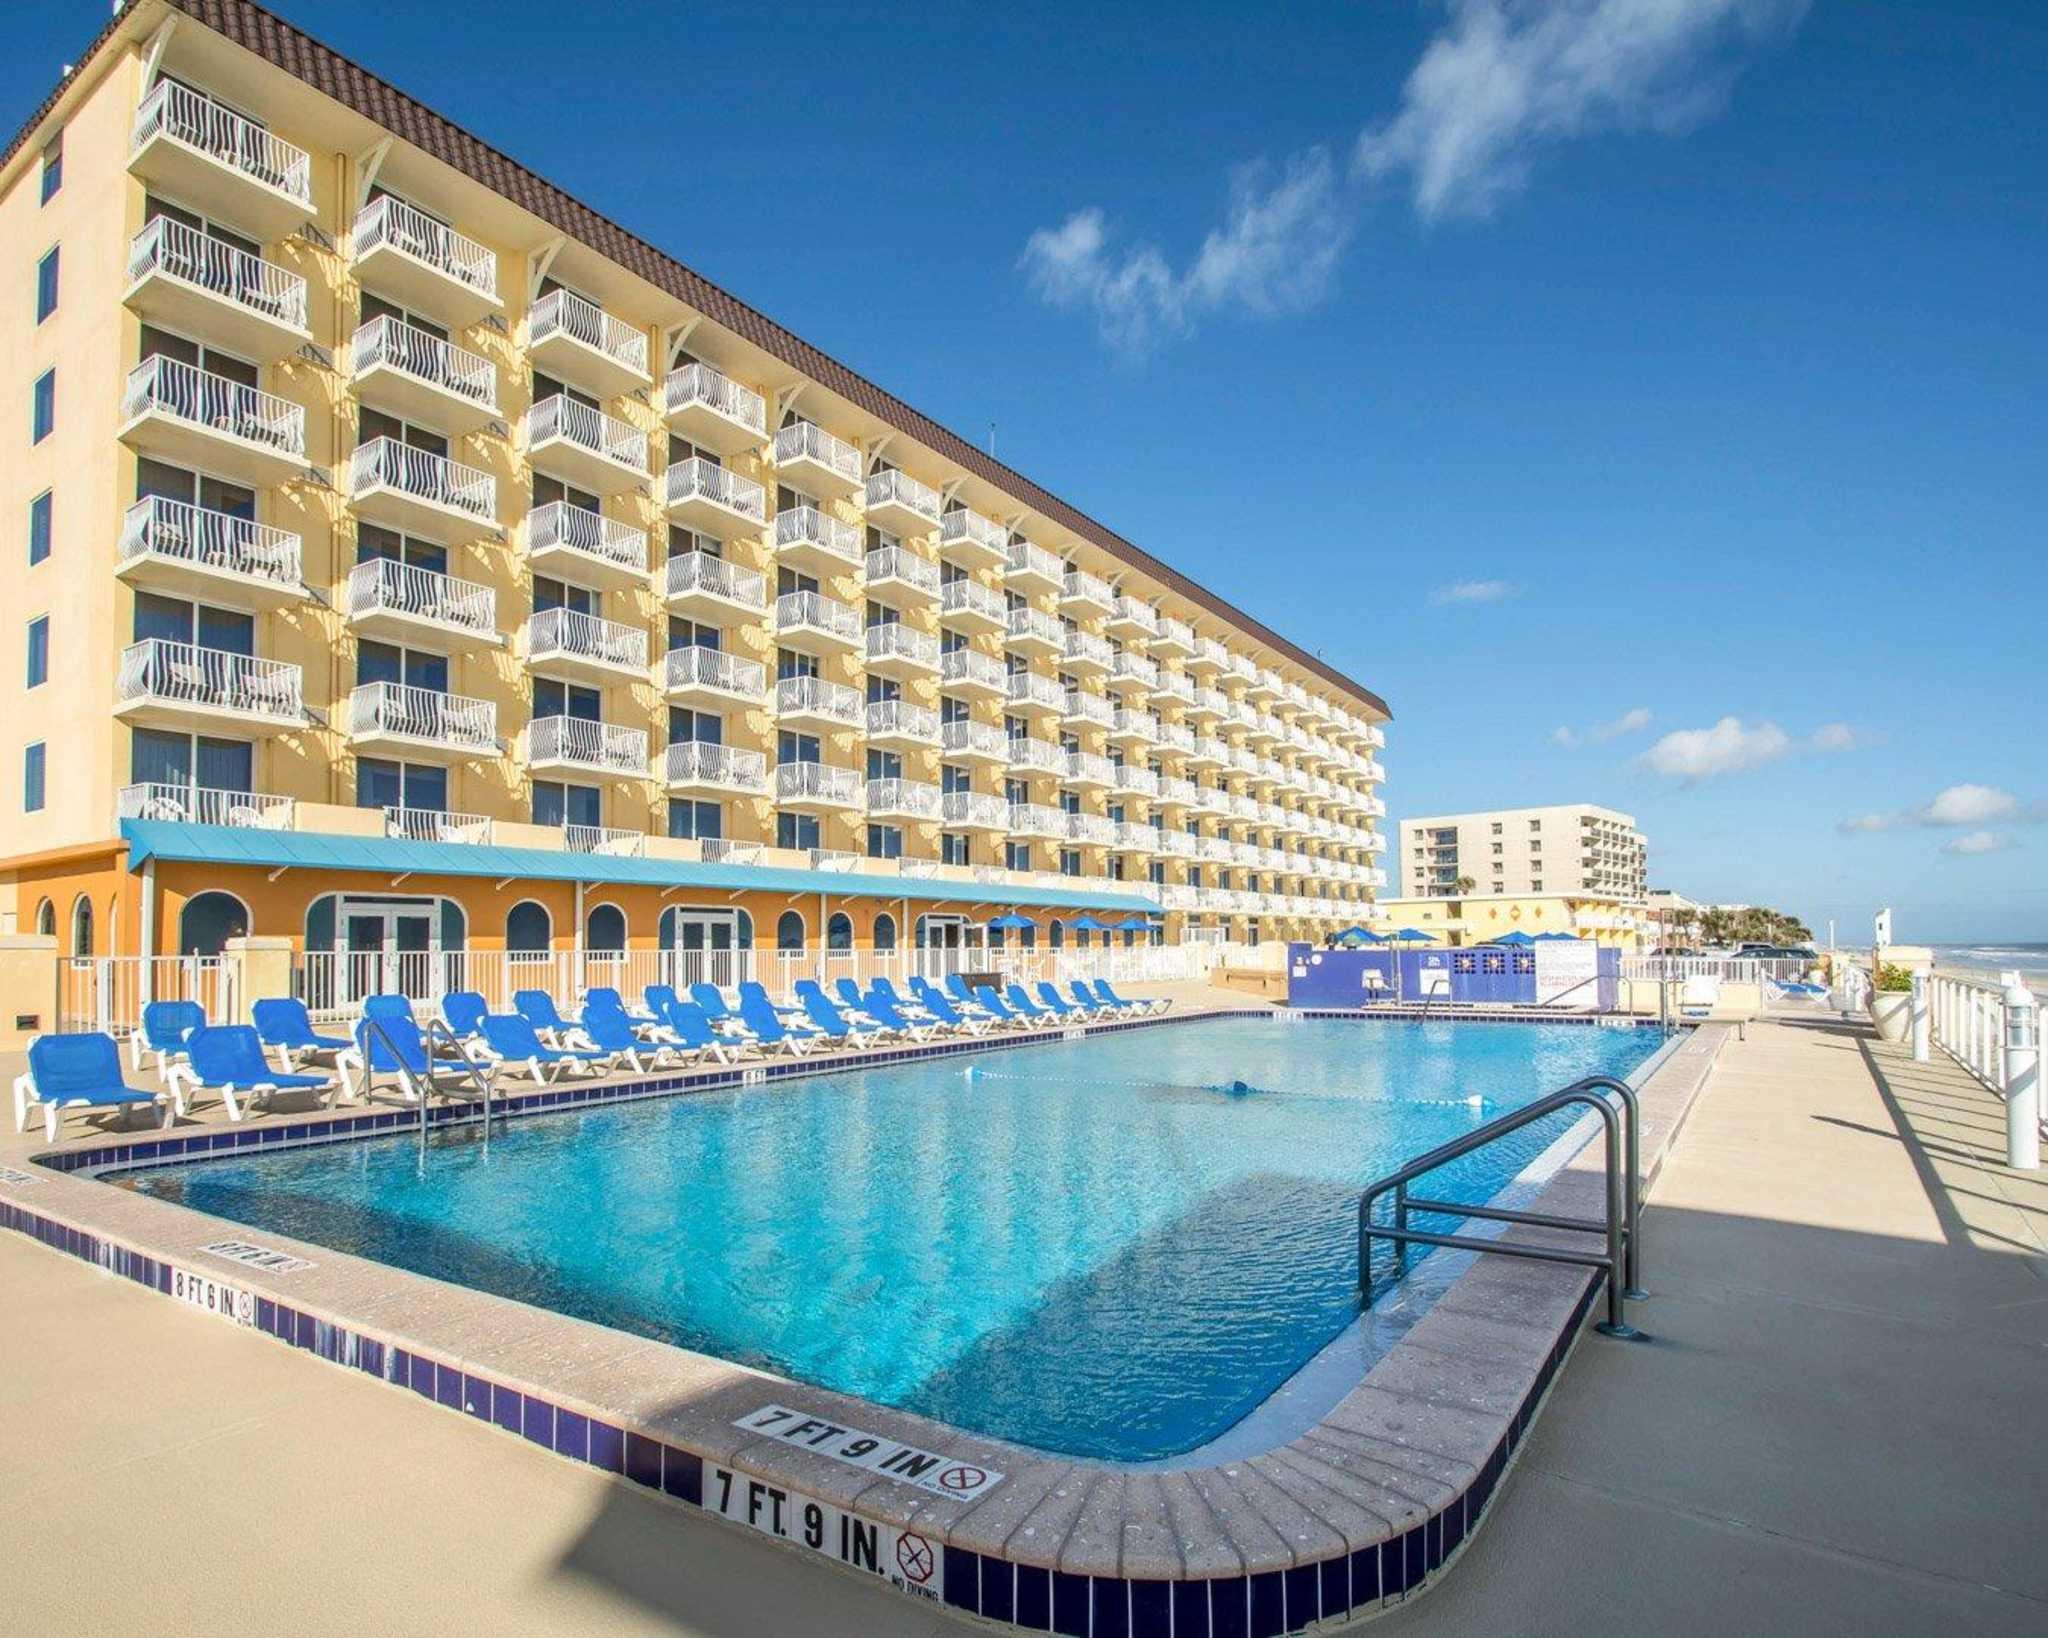 Casa Del Mar Beach Resort Ormond Beach Fl Reviews